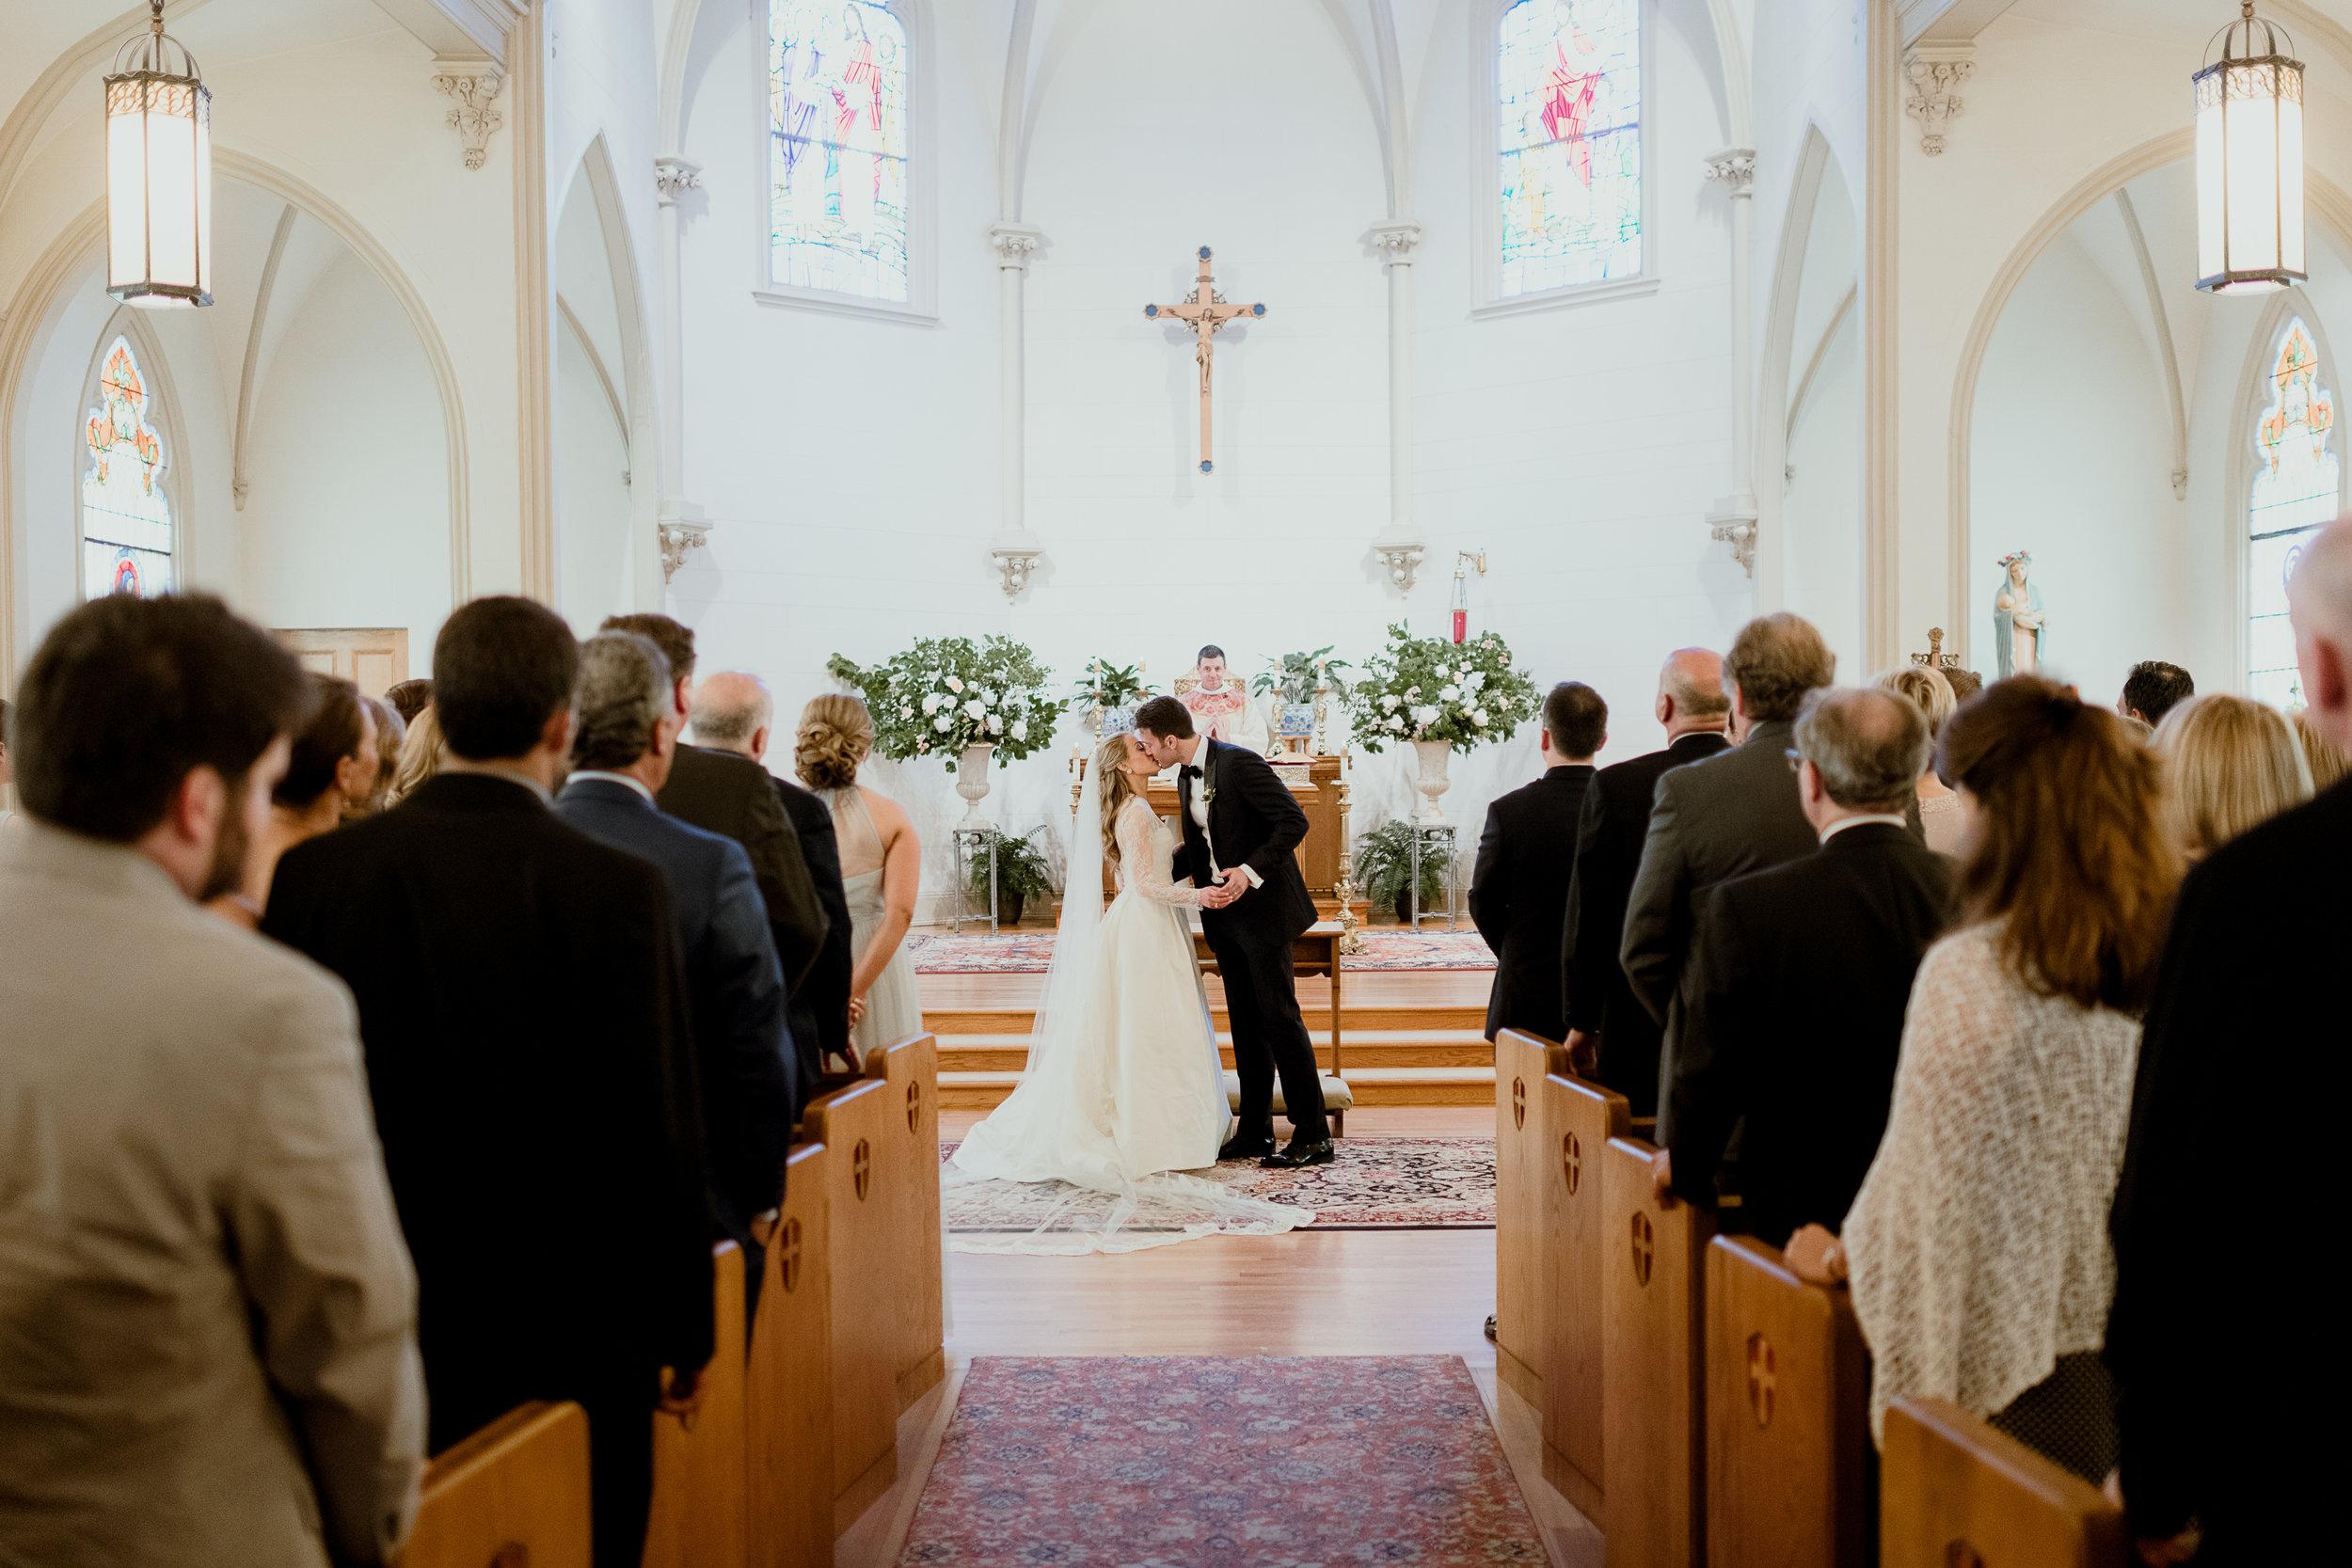 Green & White Wedding Jonathon Edwards Vineyard Wedding0-613.jpg